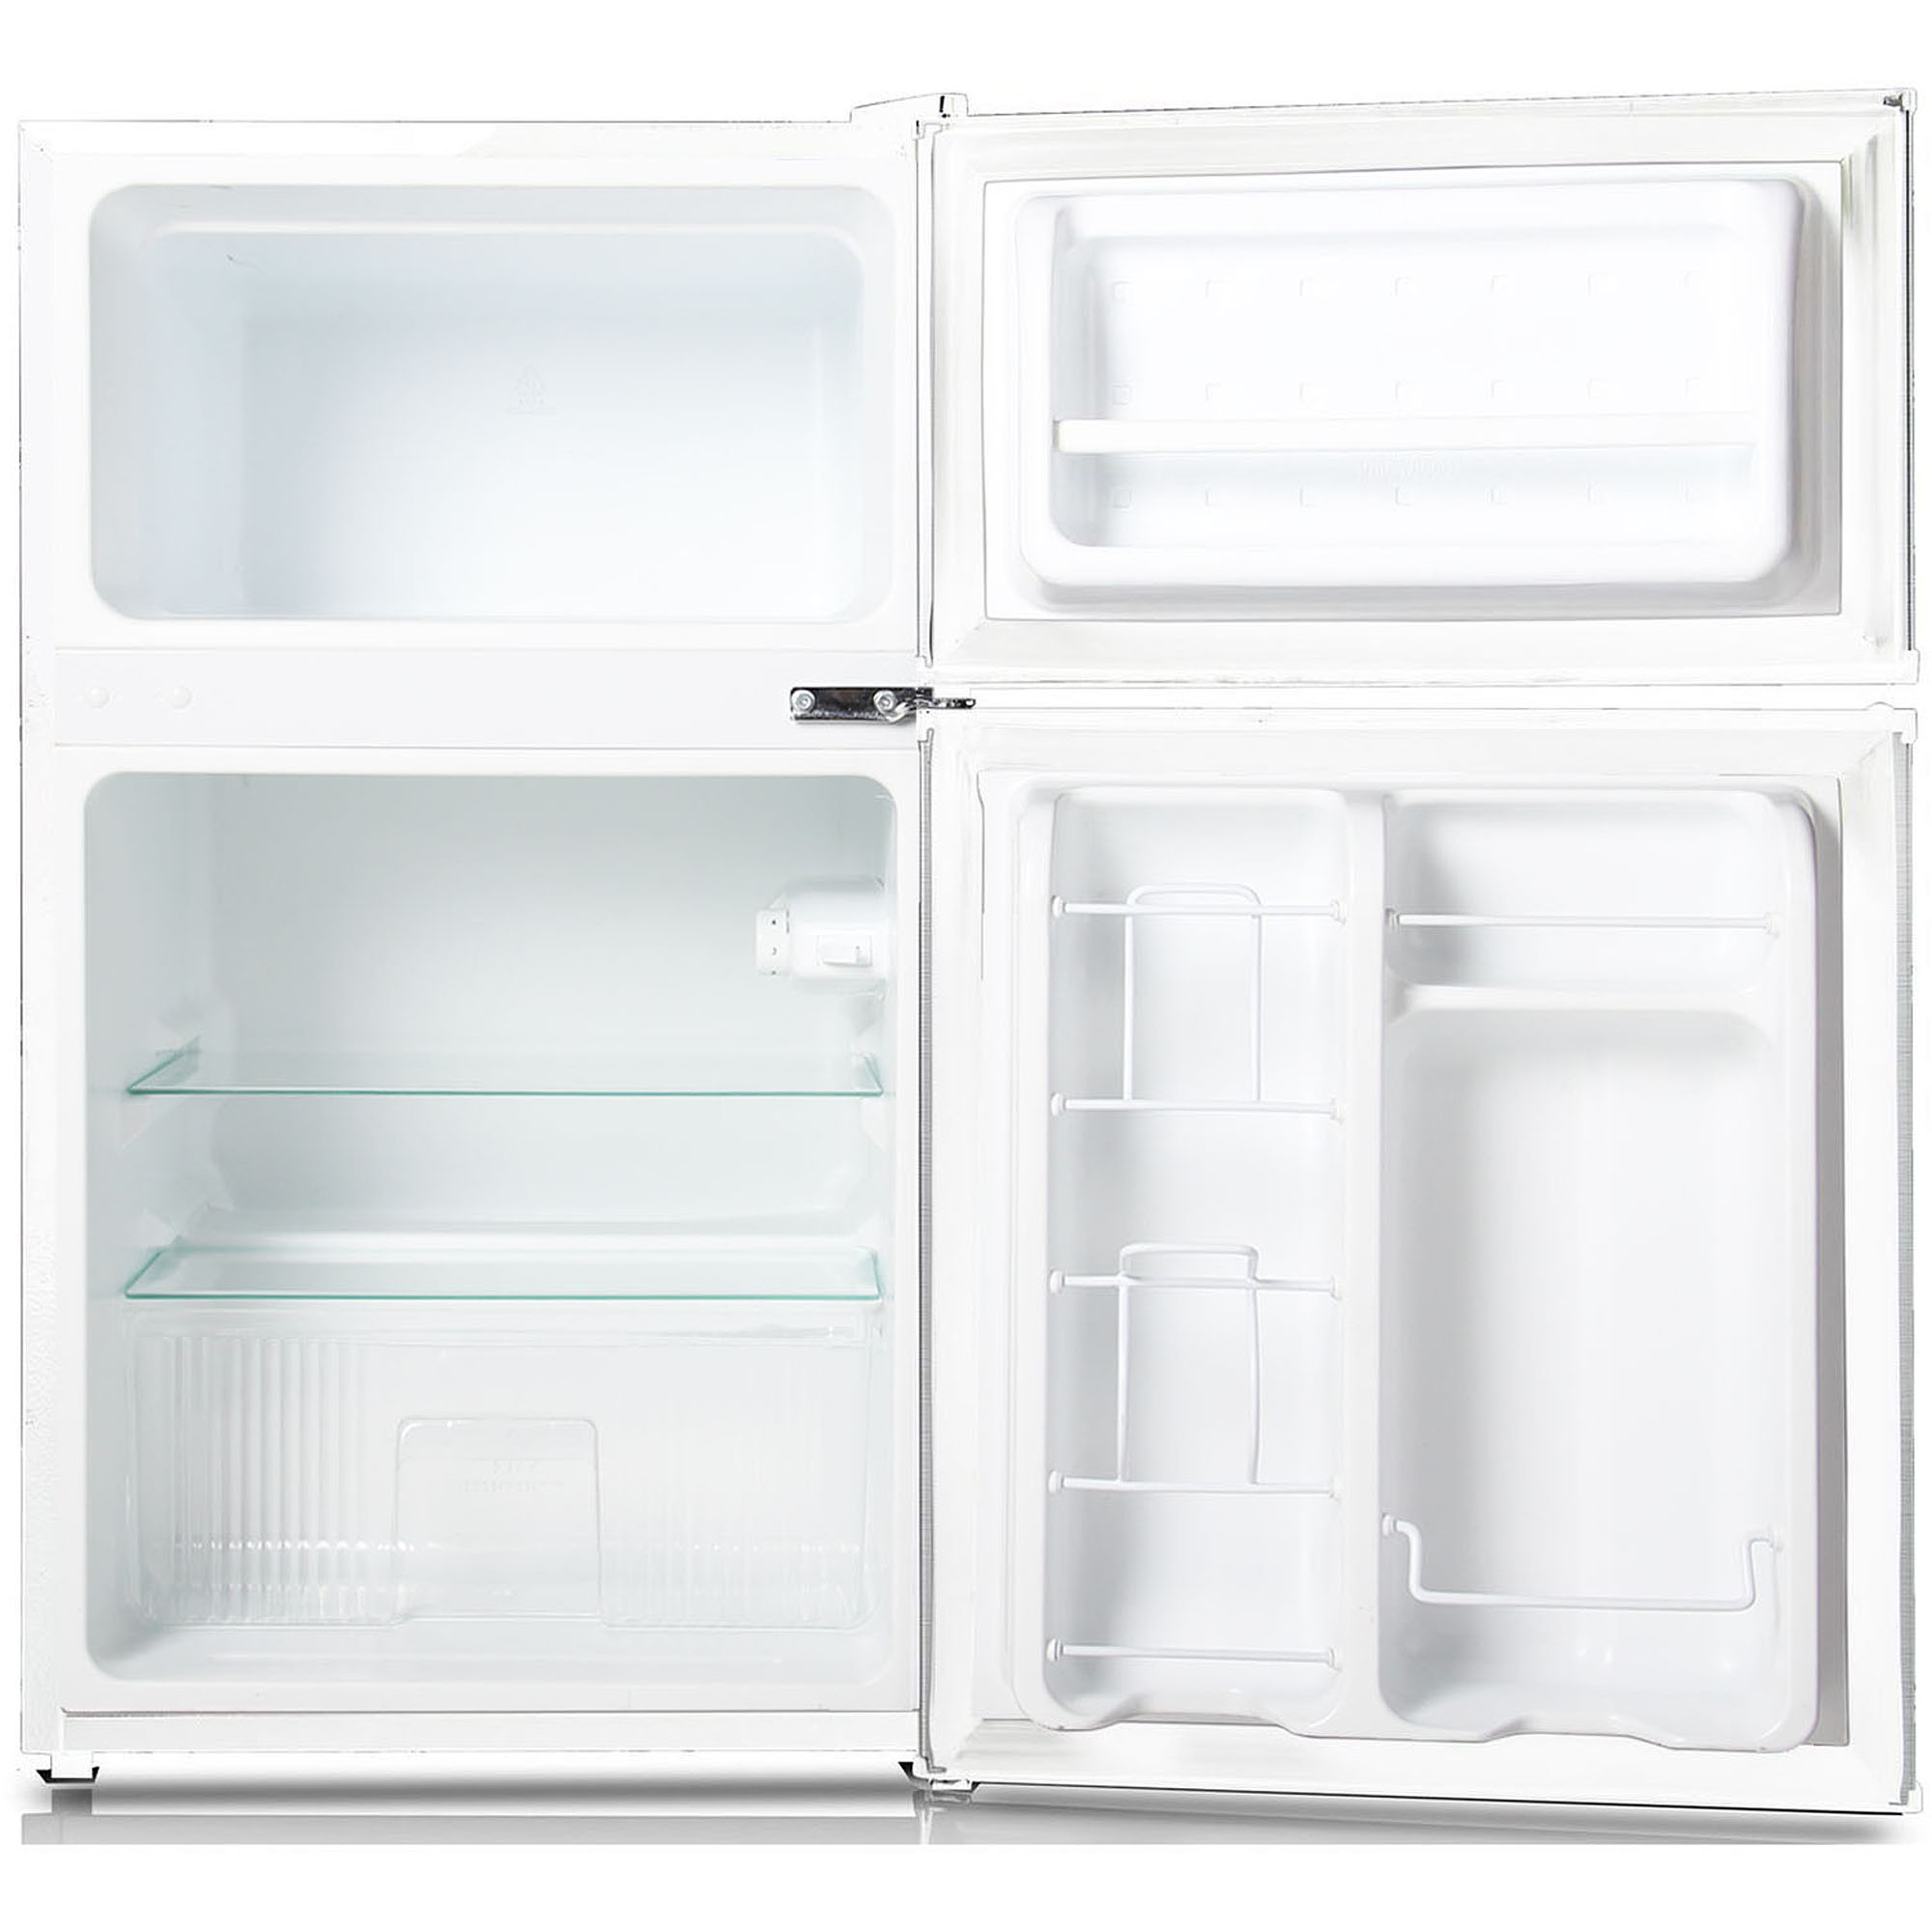 Nice Ft. Compact 2 Door Refrigerator/Freezer, White, KSTRC312CW   Walmart.com